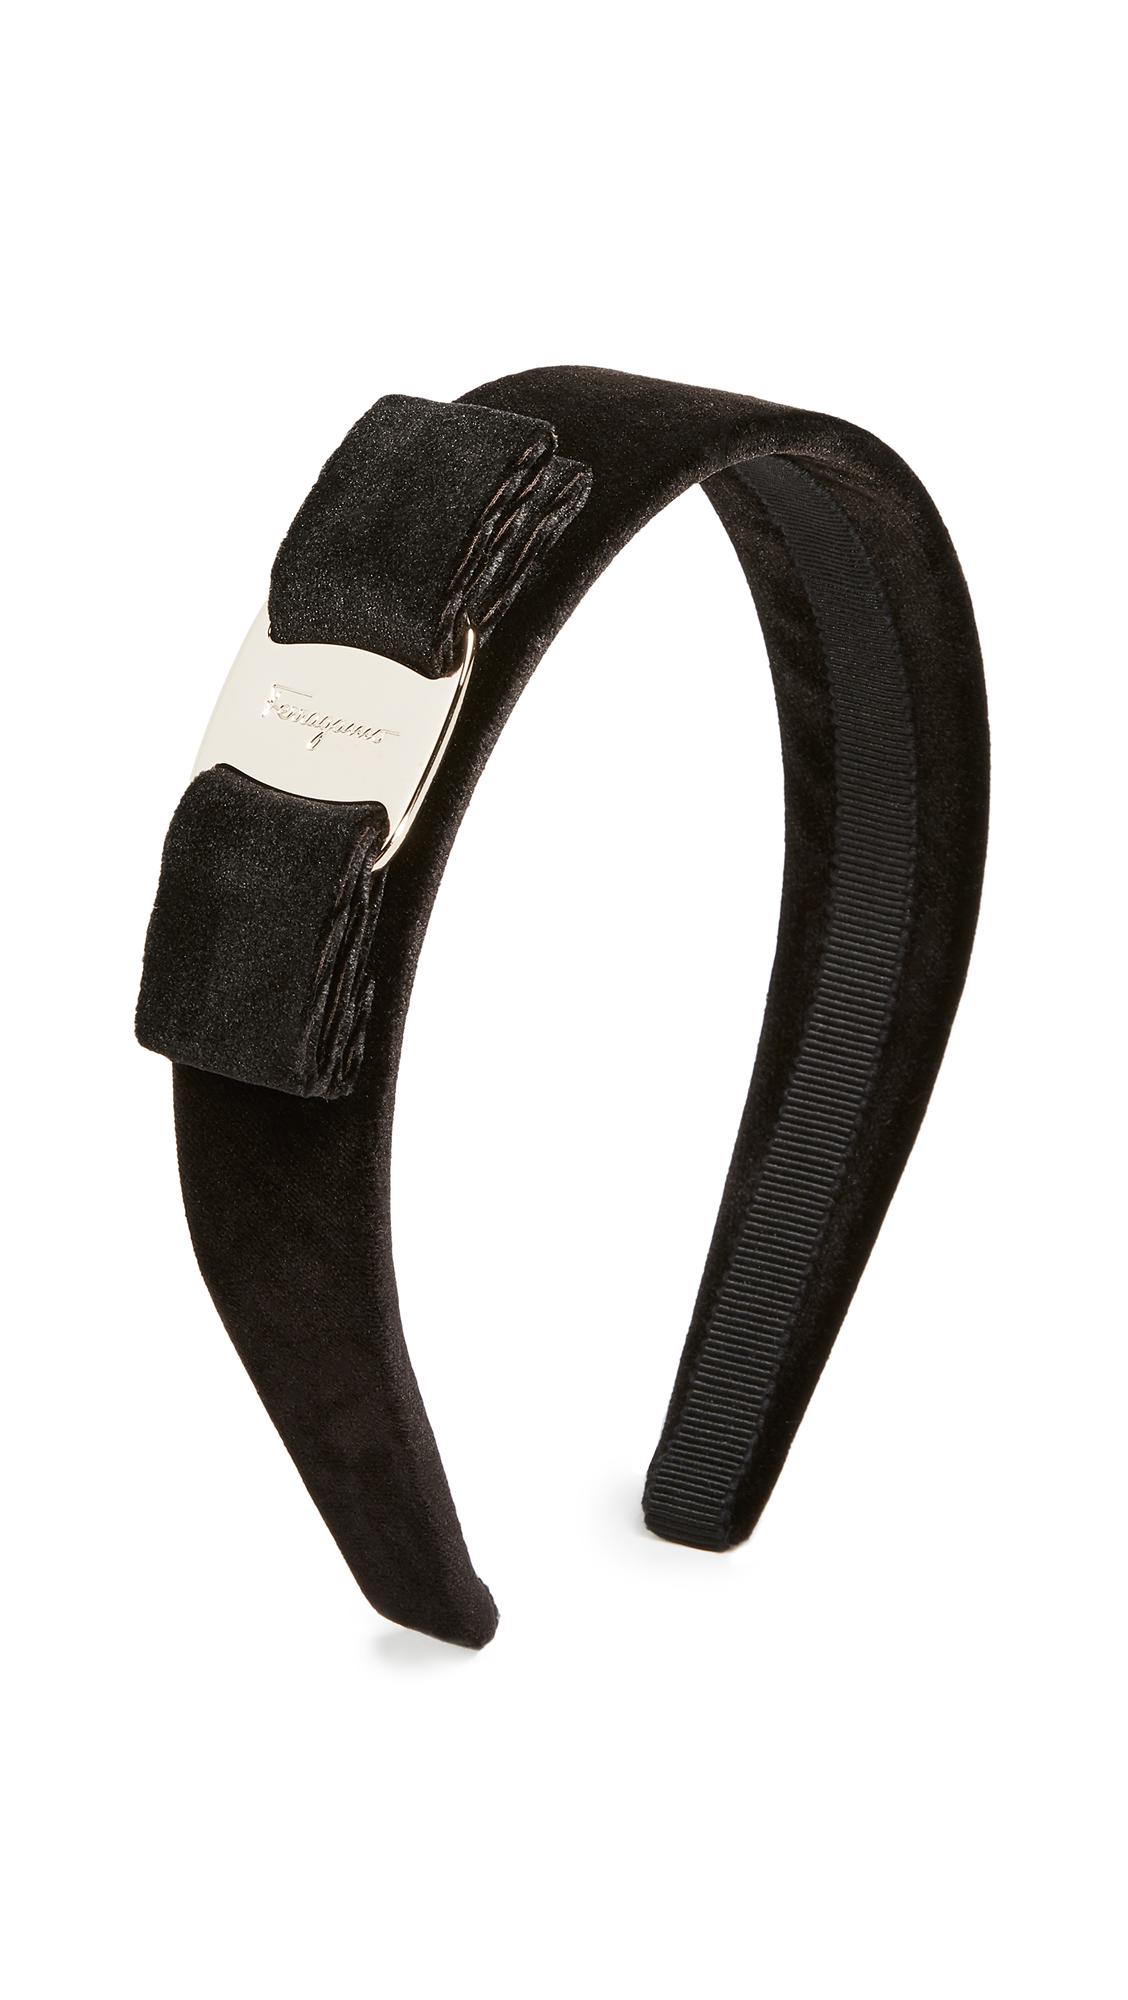 Salvatore Ferragamo Velvet Headband - Black